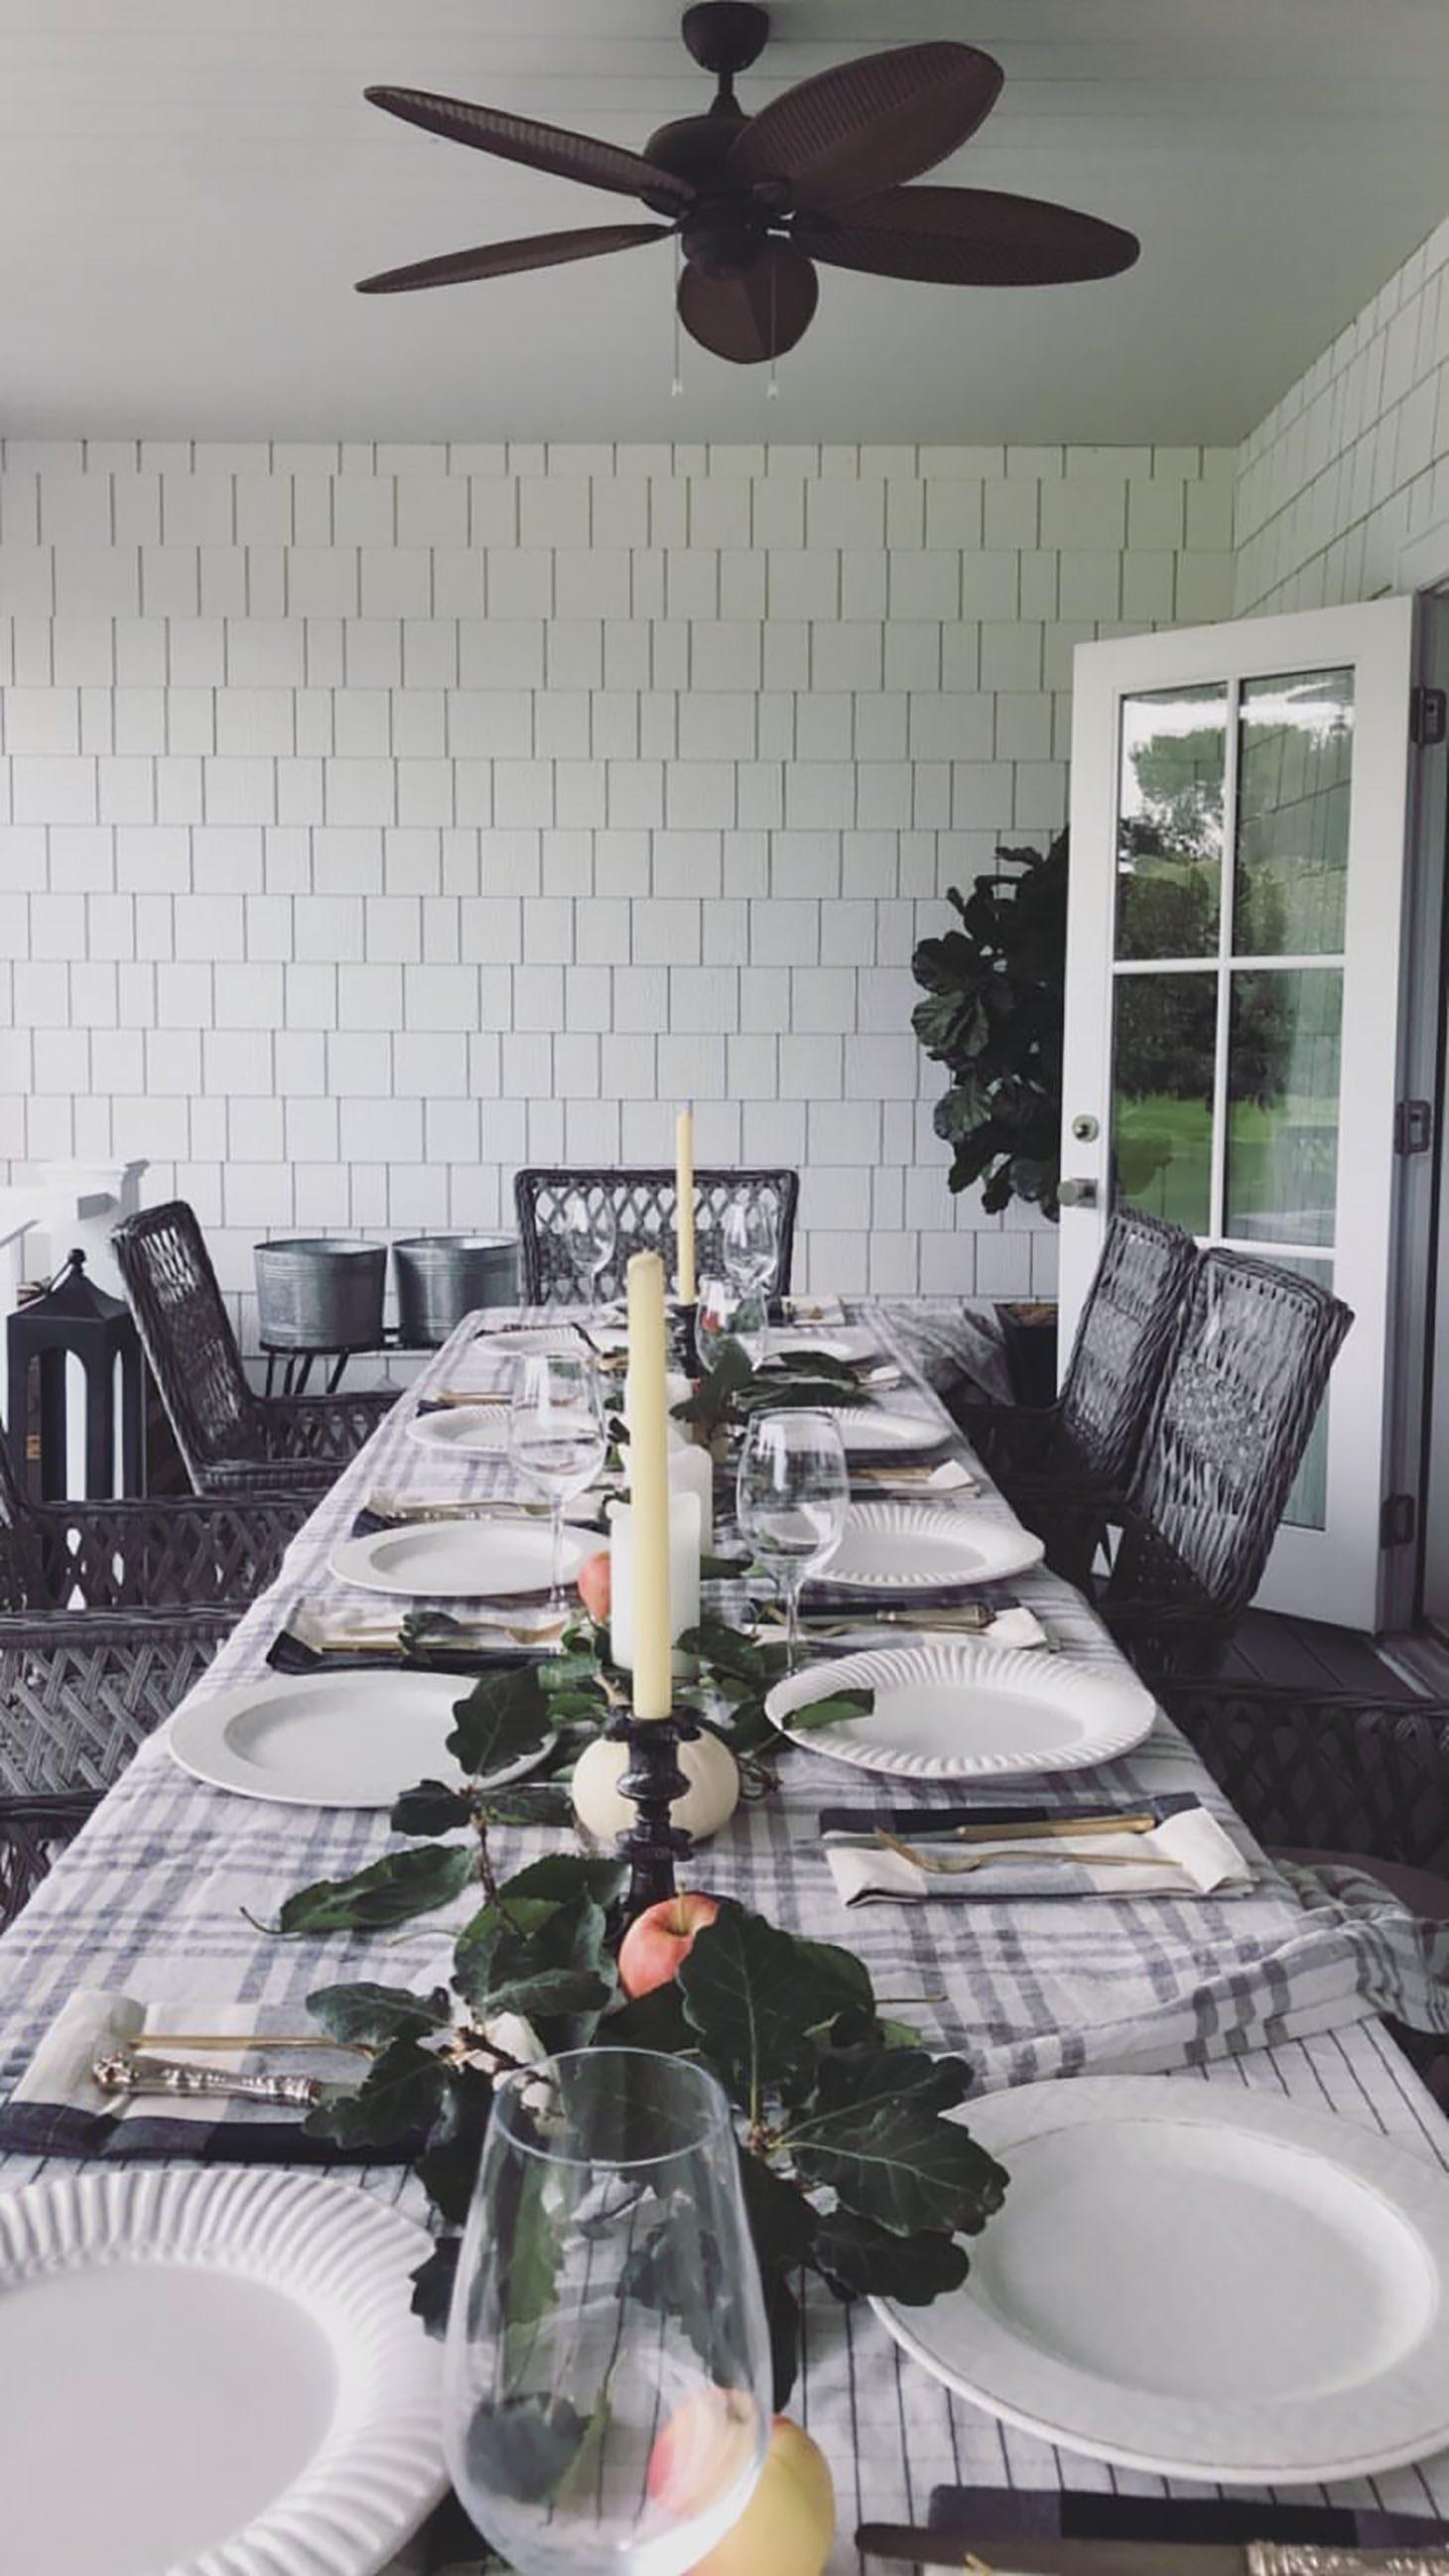 Jillian Harris How We Spent Our Thanksgiving